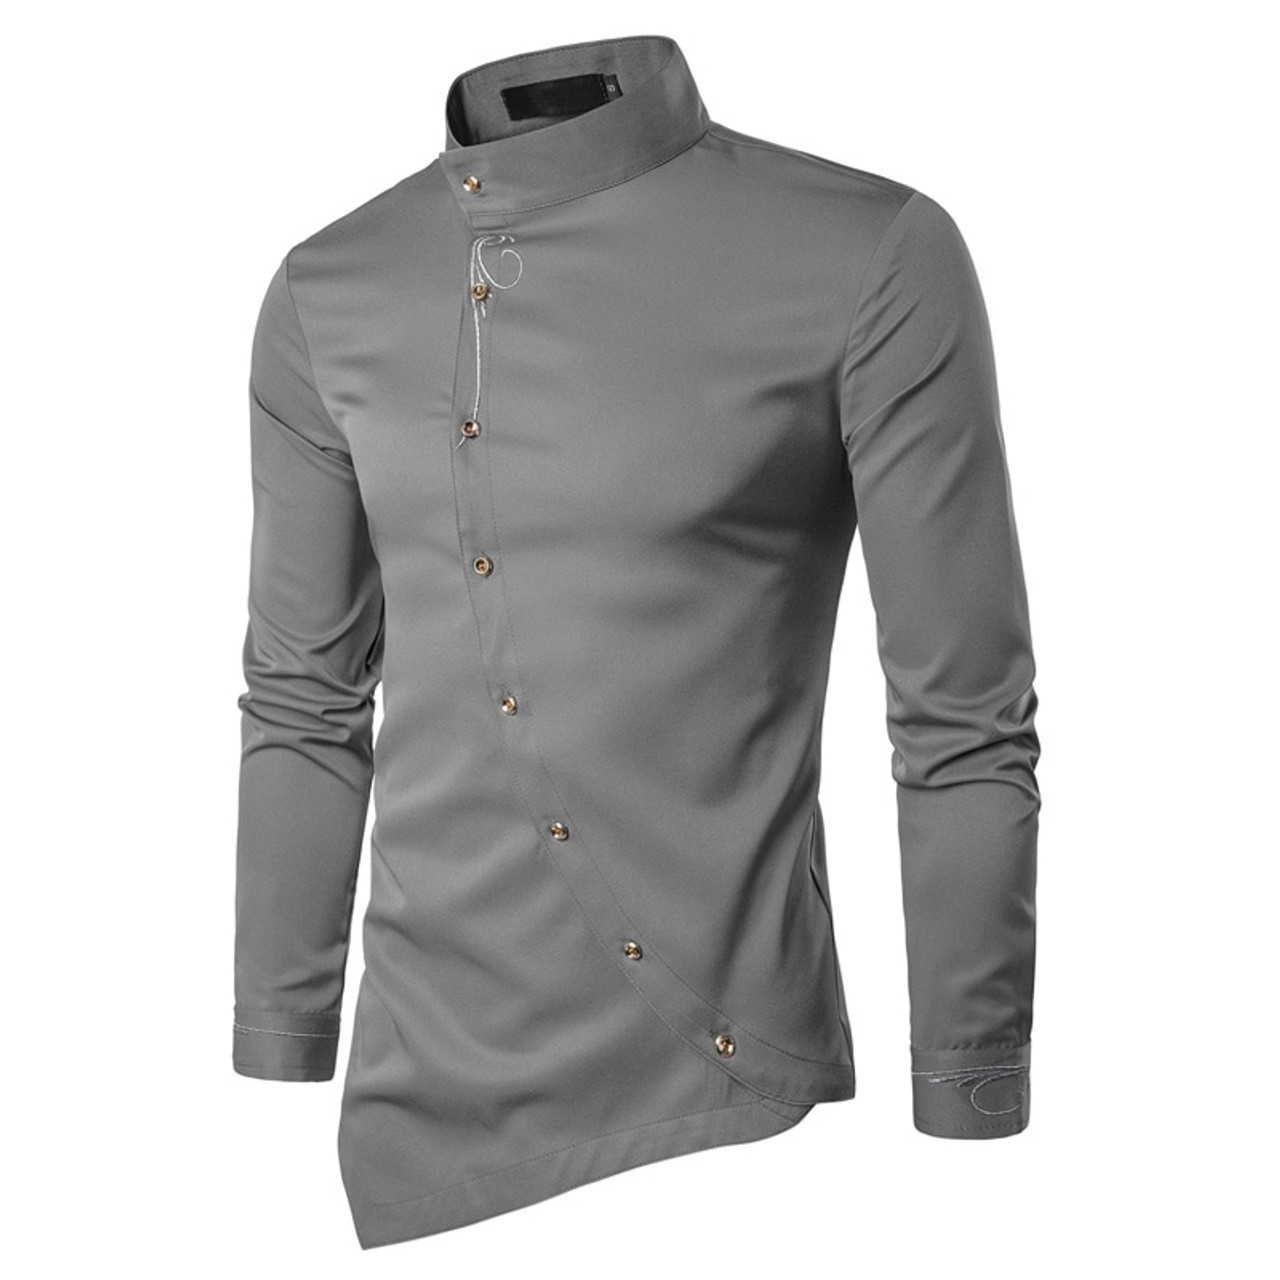 0303b5d6 ... 2018 Fashion New Male Shirt Long Sleeve Mens Clothes Oblique Button  Dress Shirts Mandarin Collar Men ...